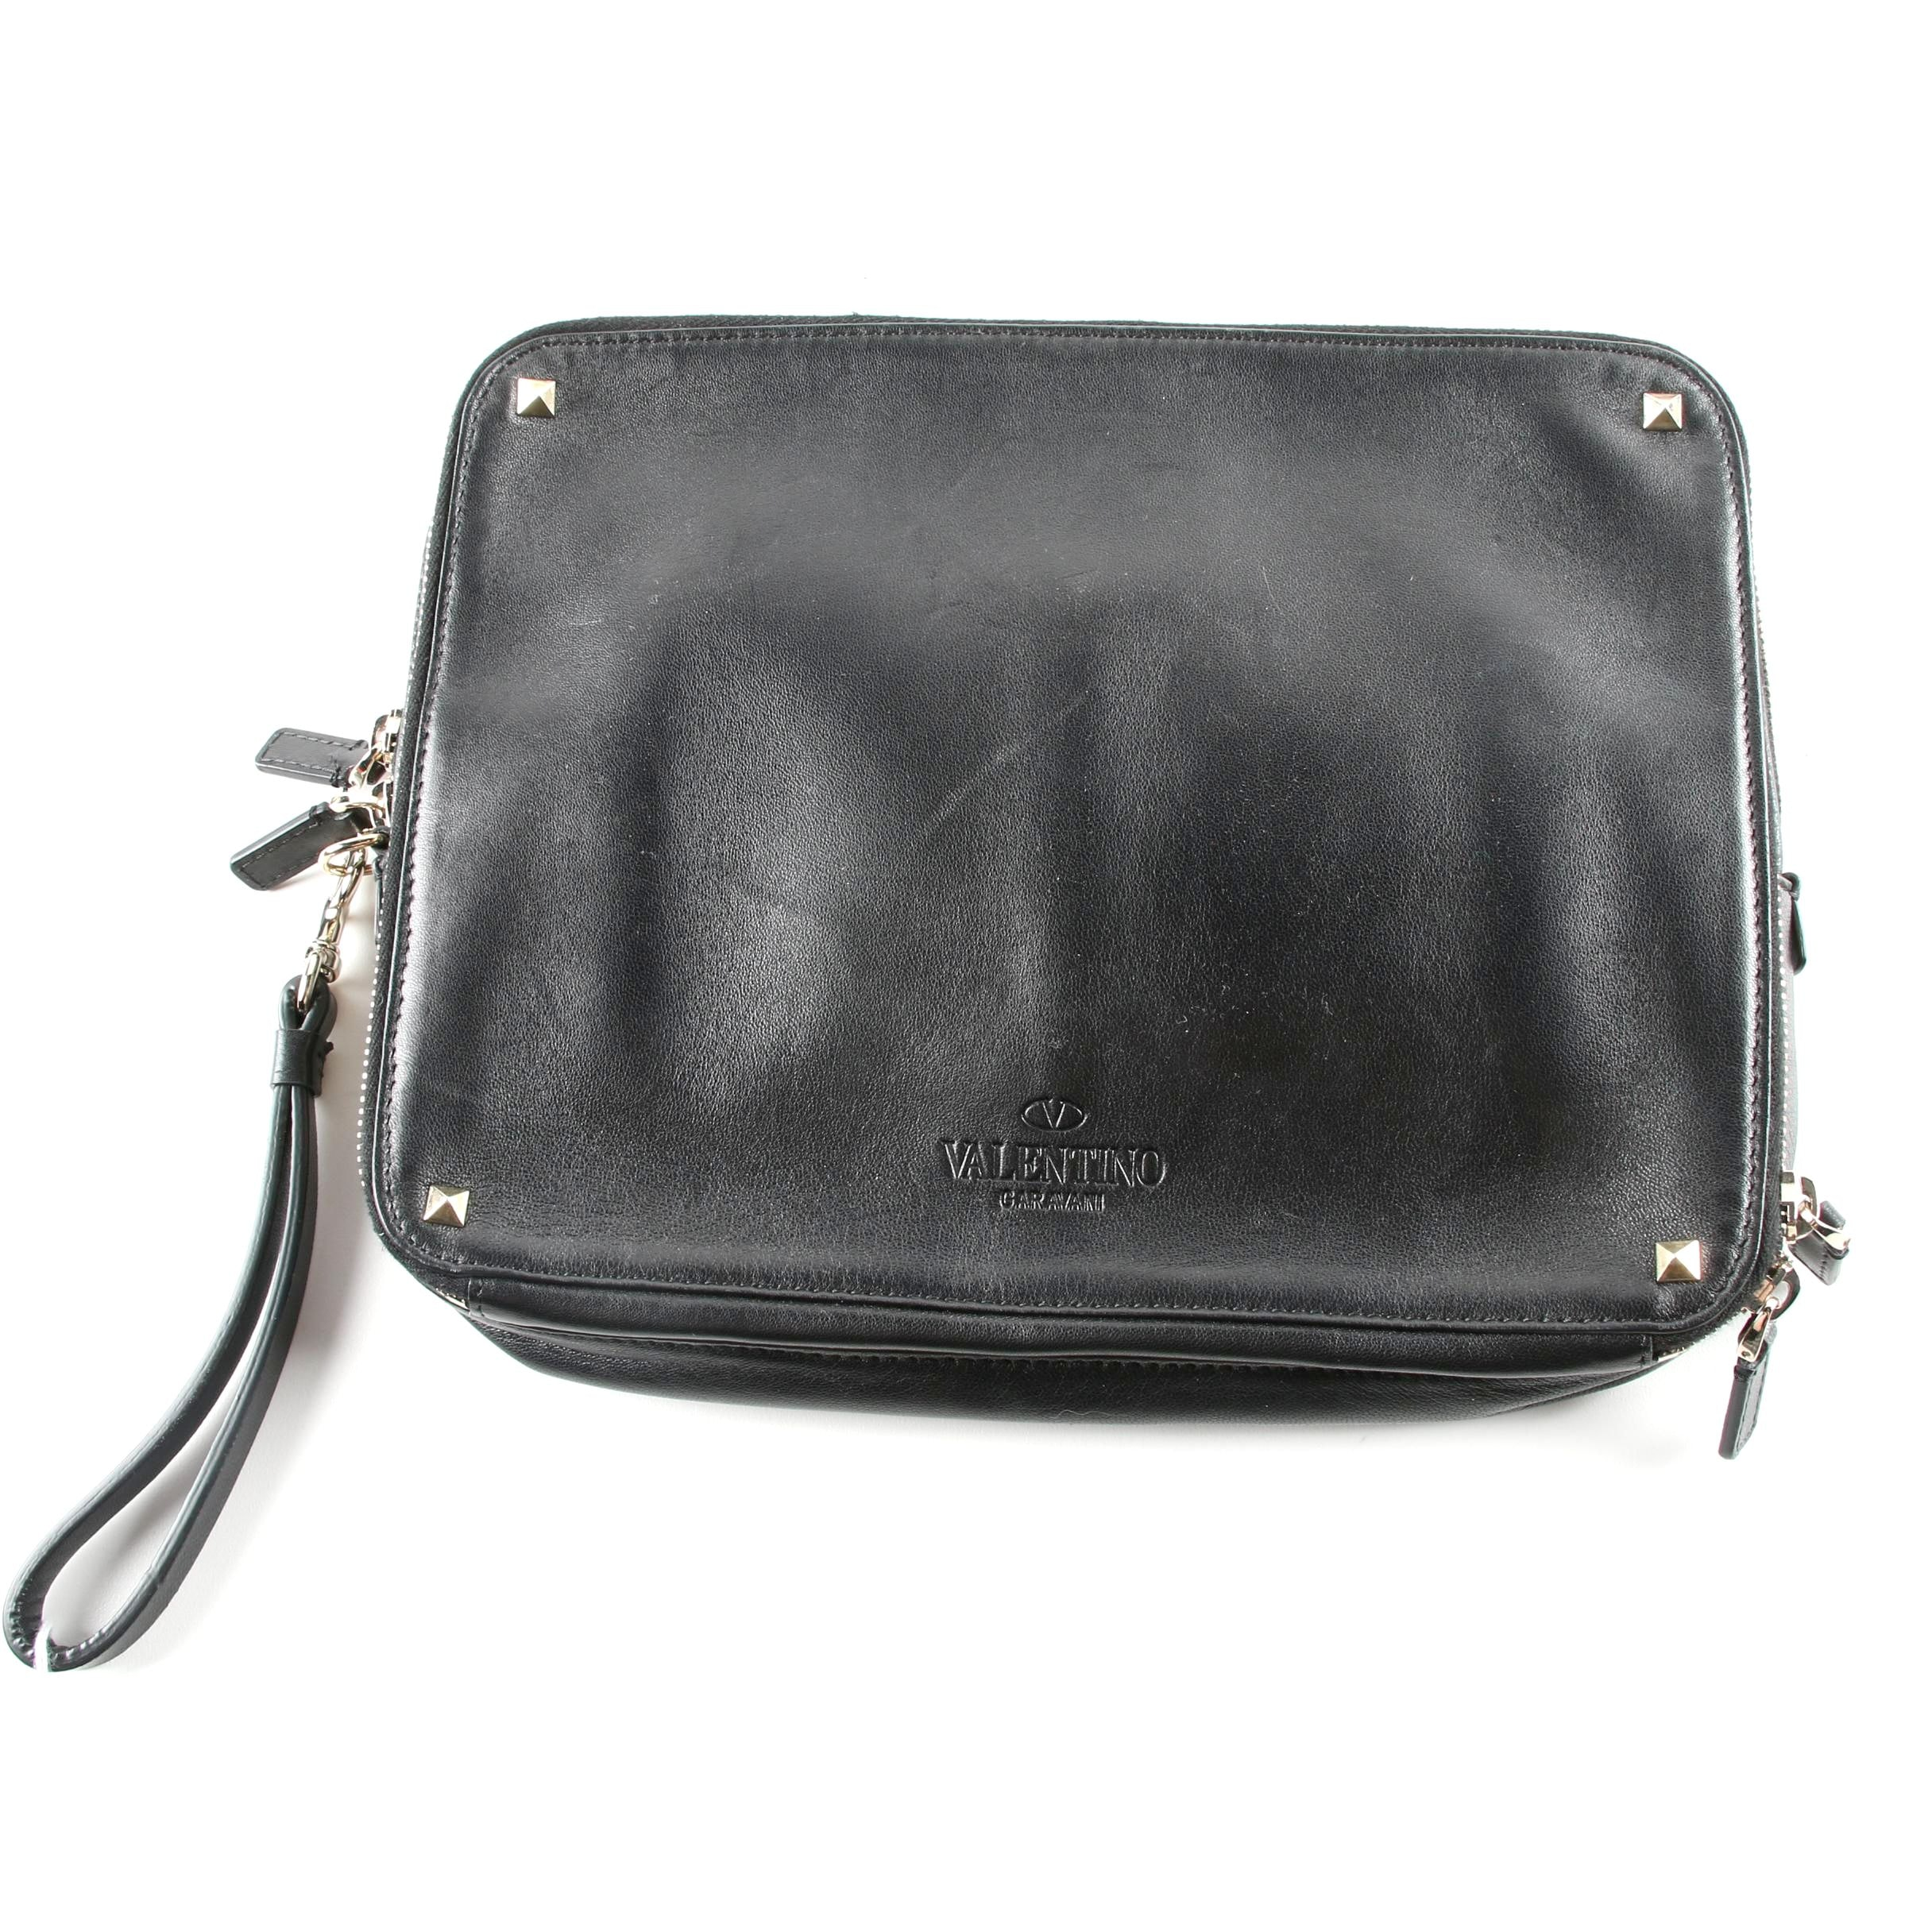 Valentino Garavani Rockstud Black Leather Tablet Case